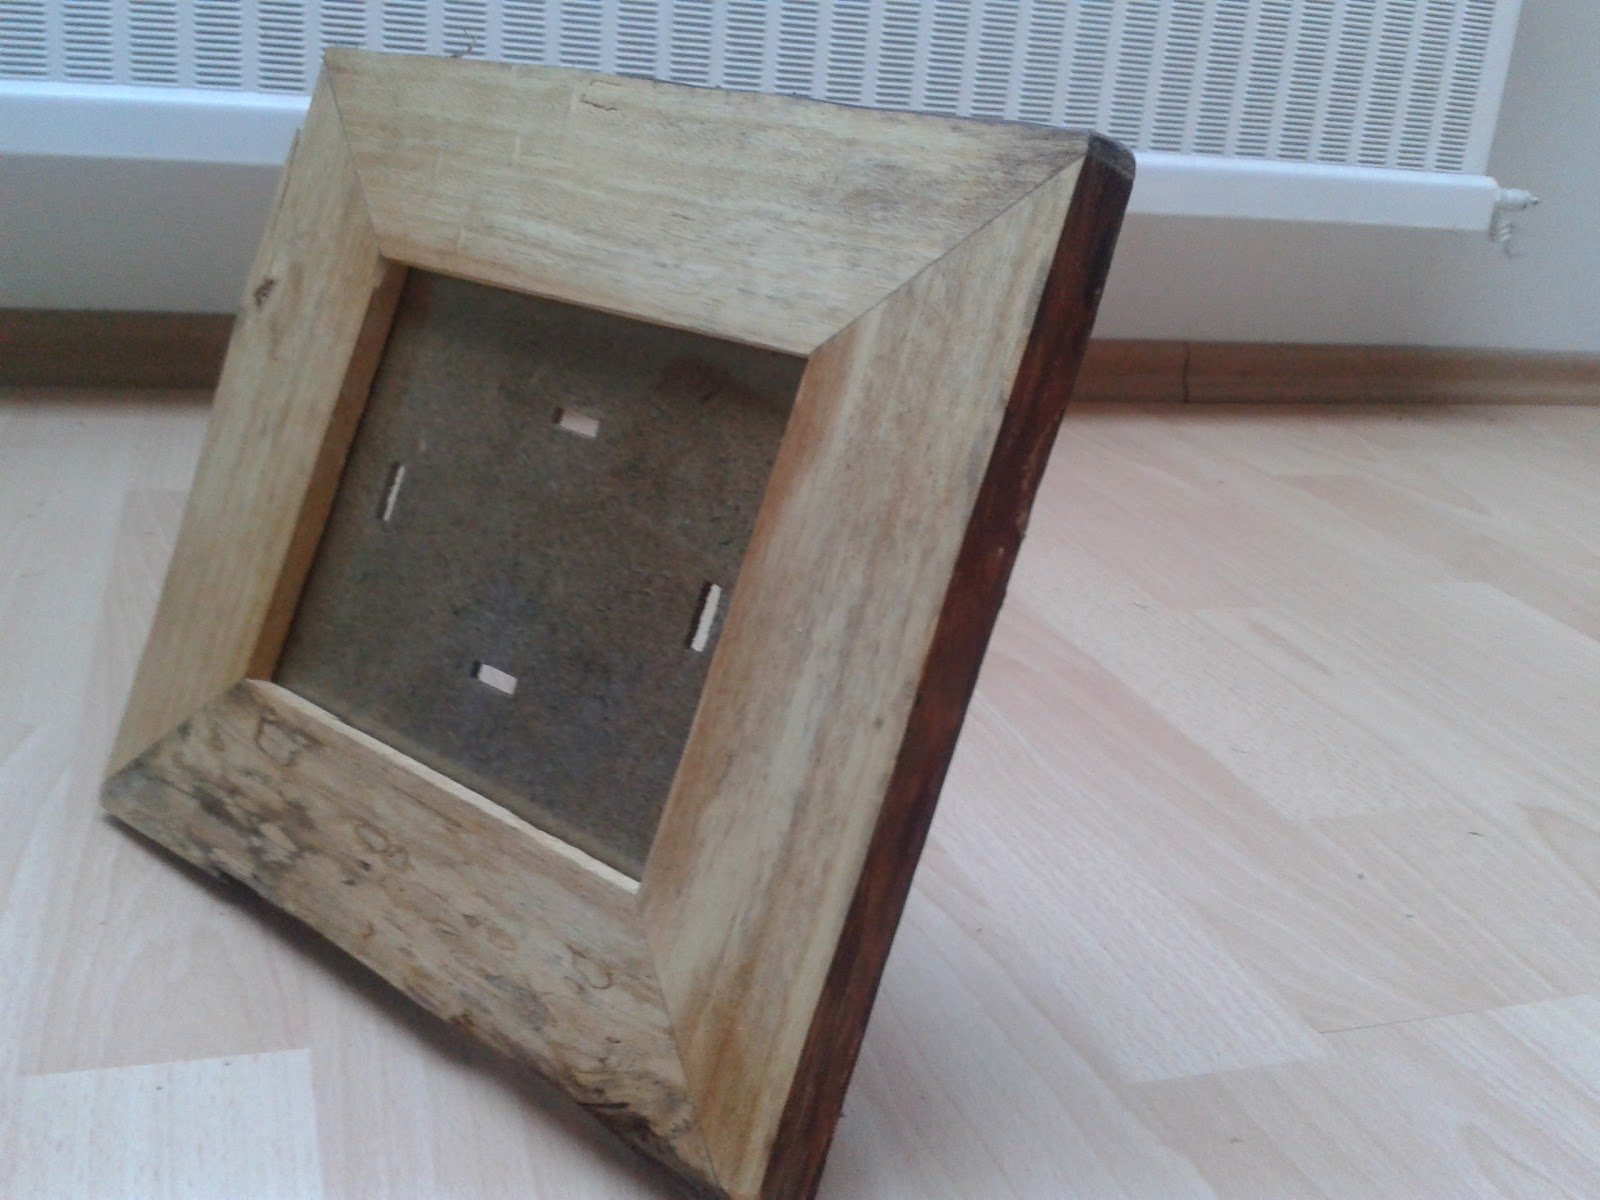 alter Holz - Bilderrahmen 10x15cm | Igerskys Werke